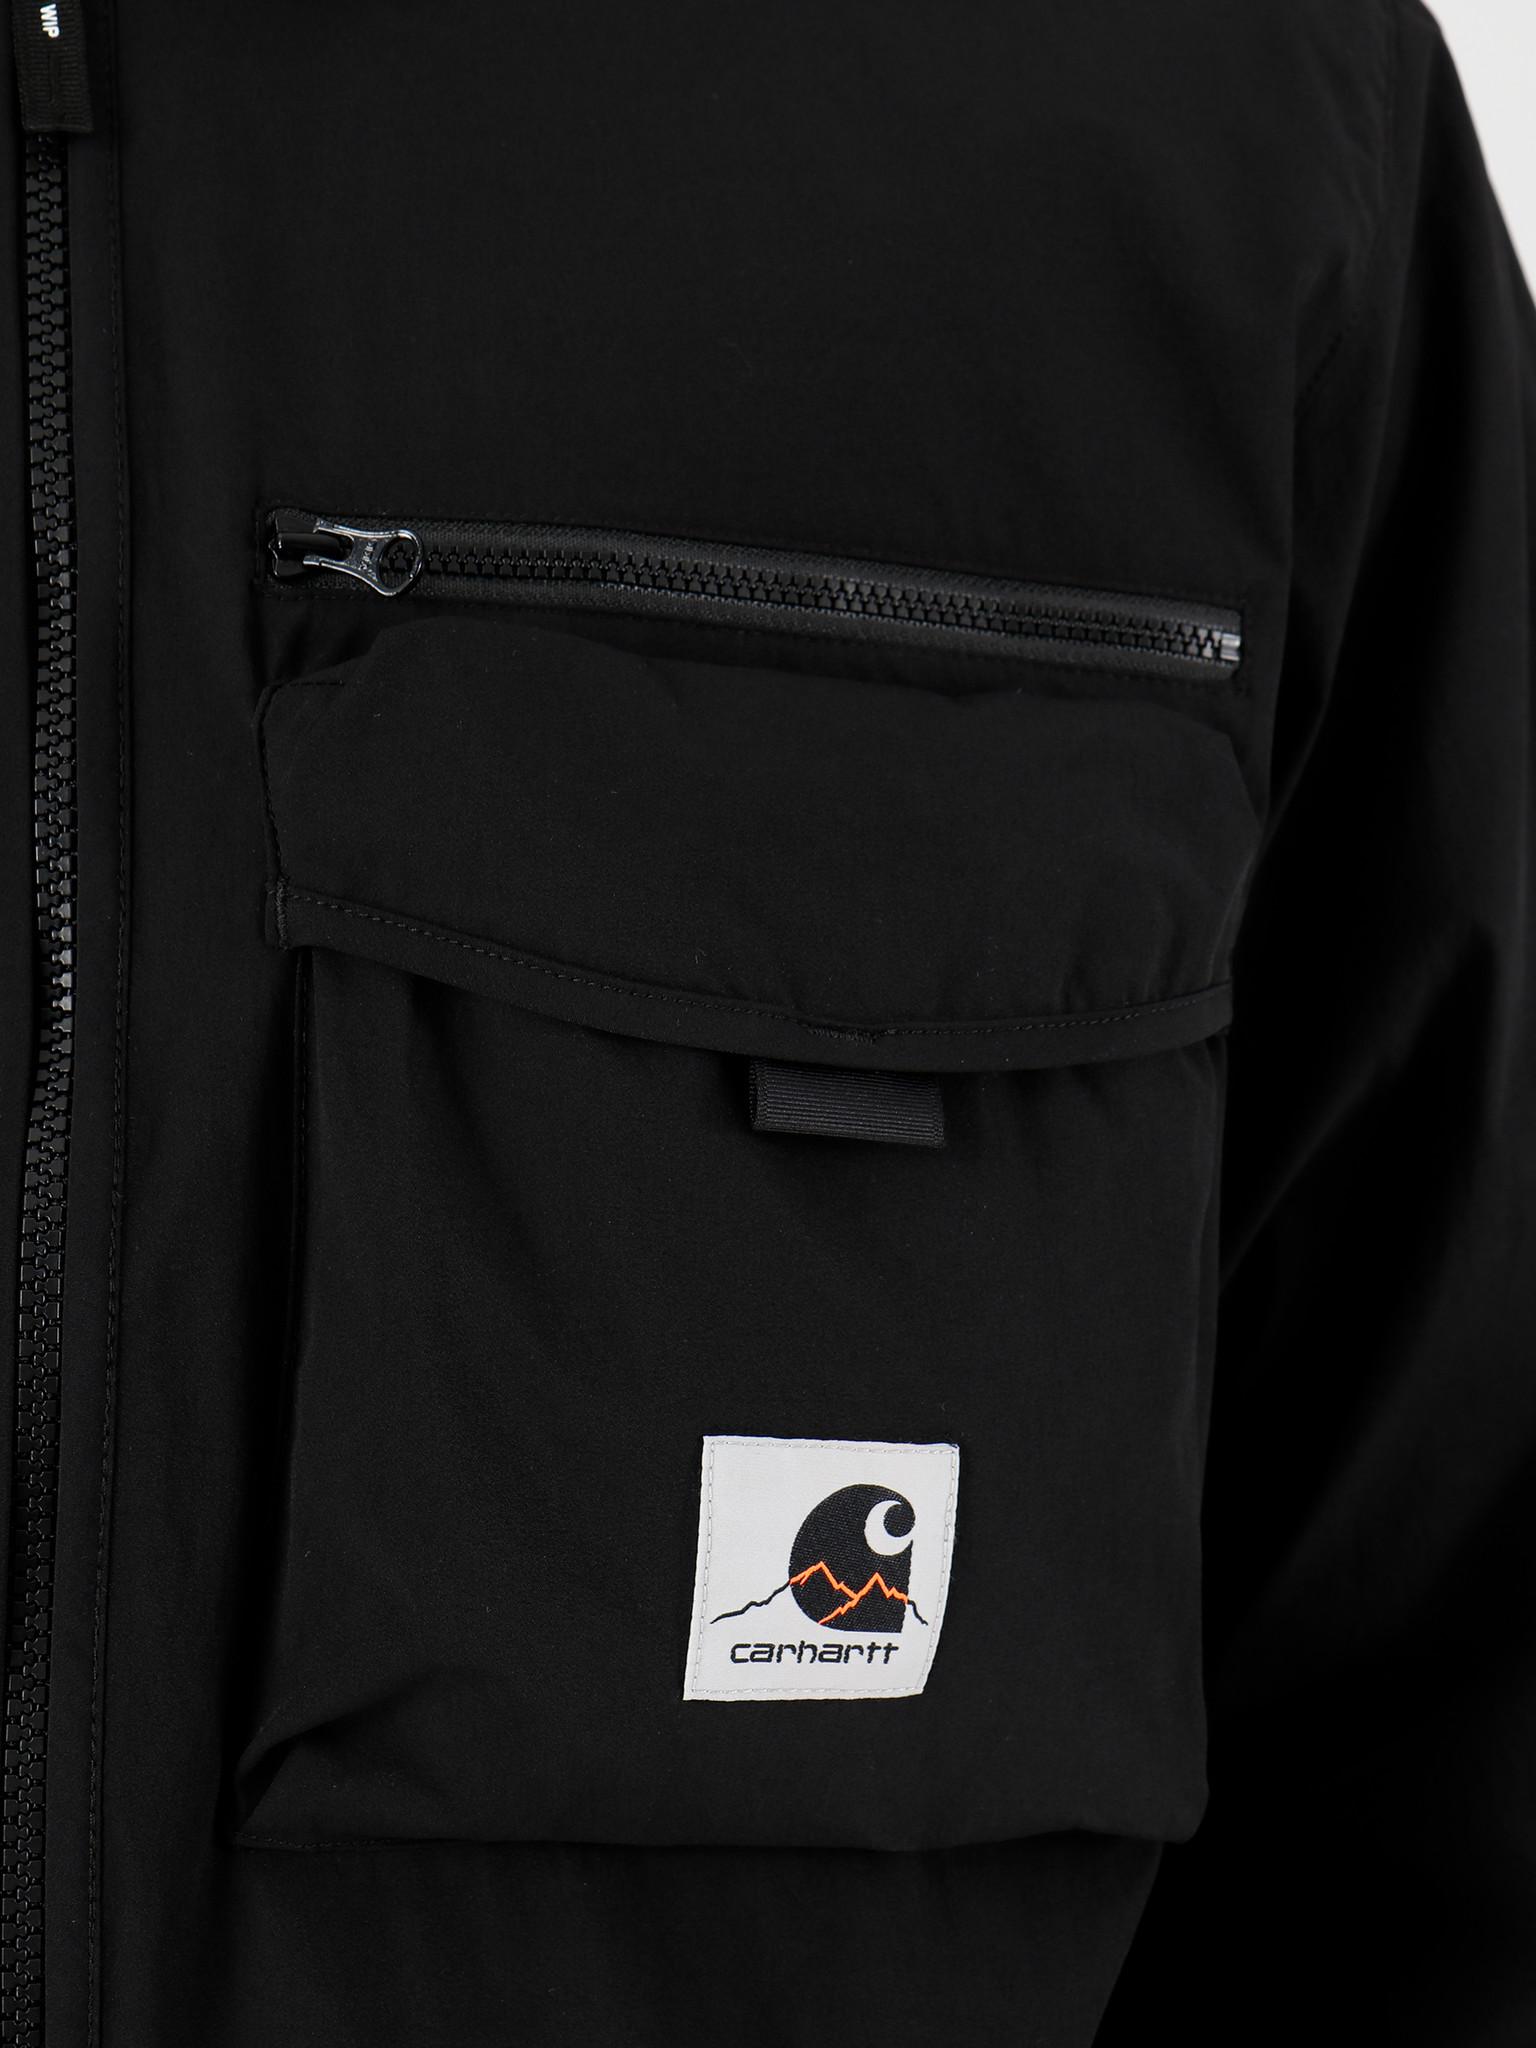 Carhartt WIP Carhartt WIP Hayes Shirt Jac Black I027509-8900